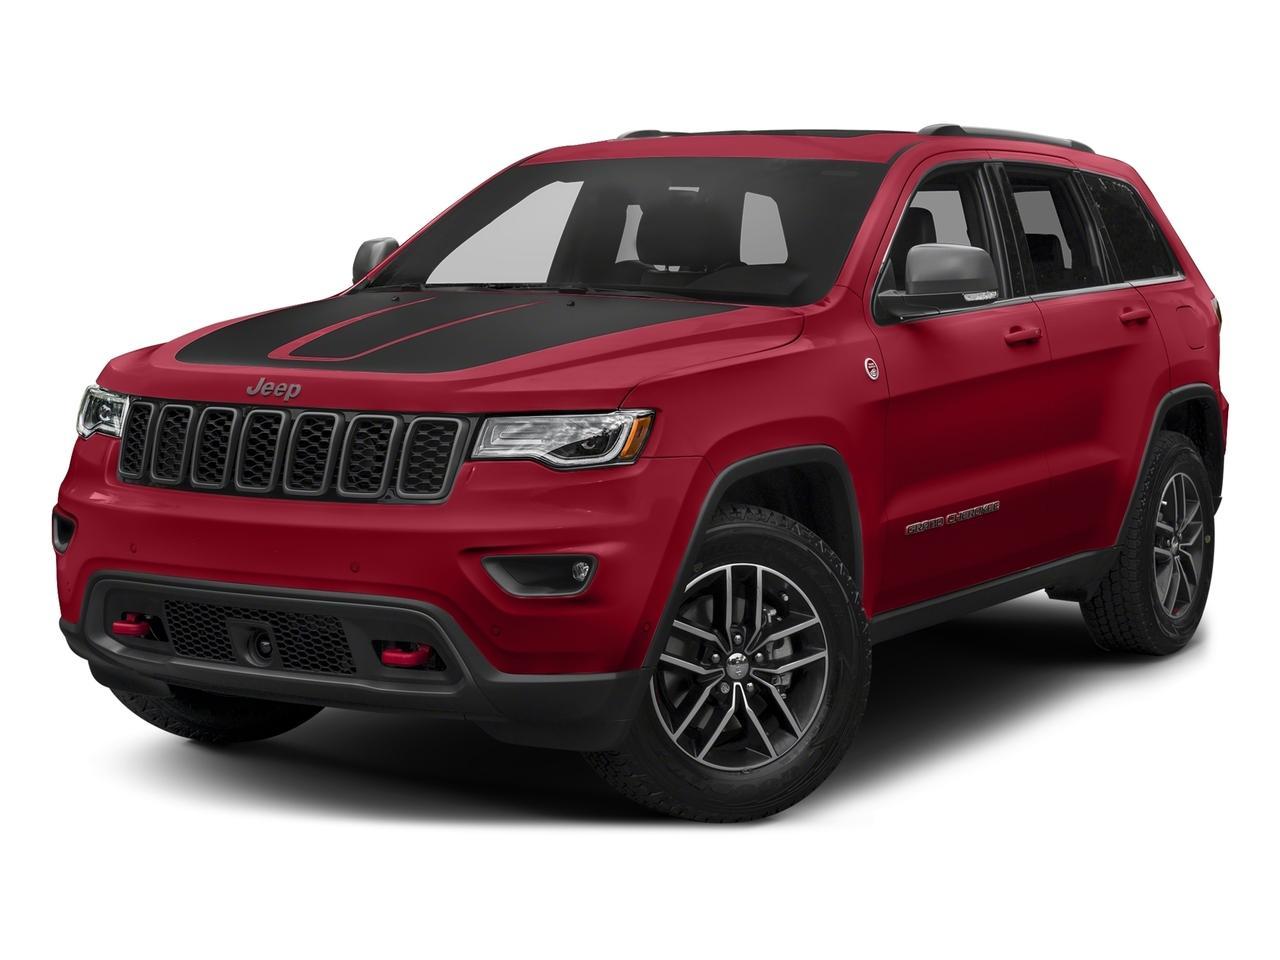 2017 Jeep Grand Cherokee Vehicle Photo in Casper, WY 82609